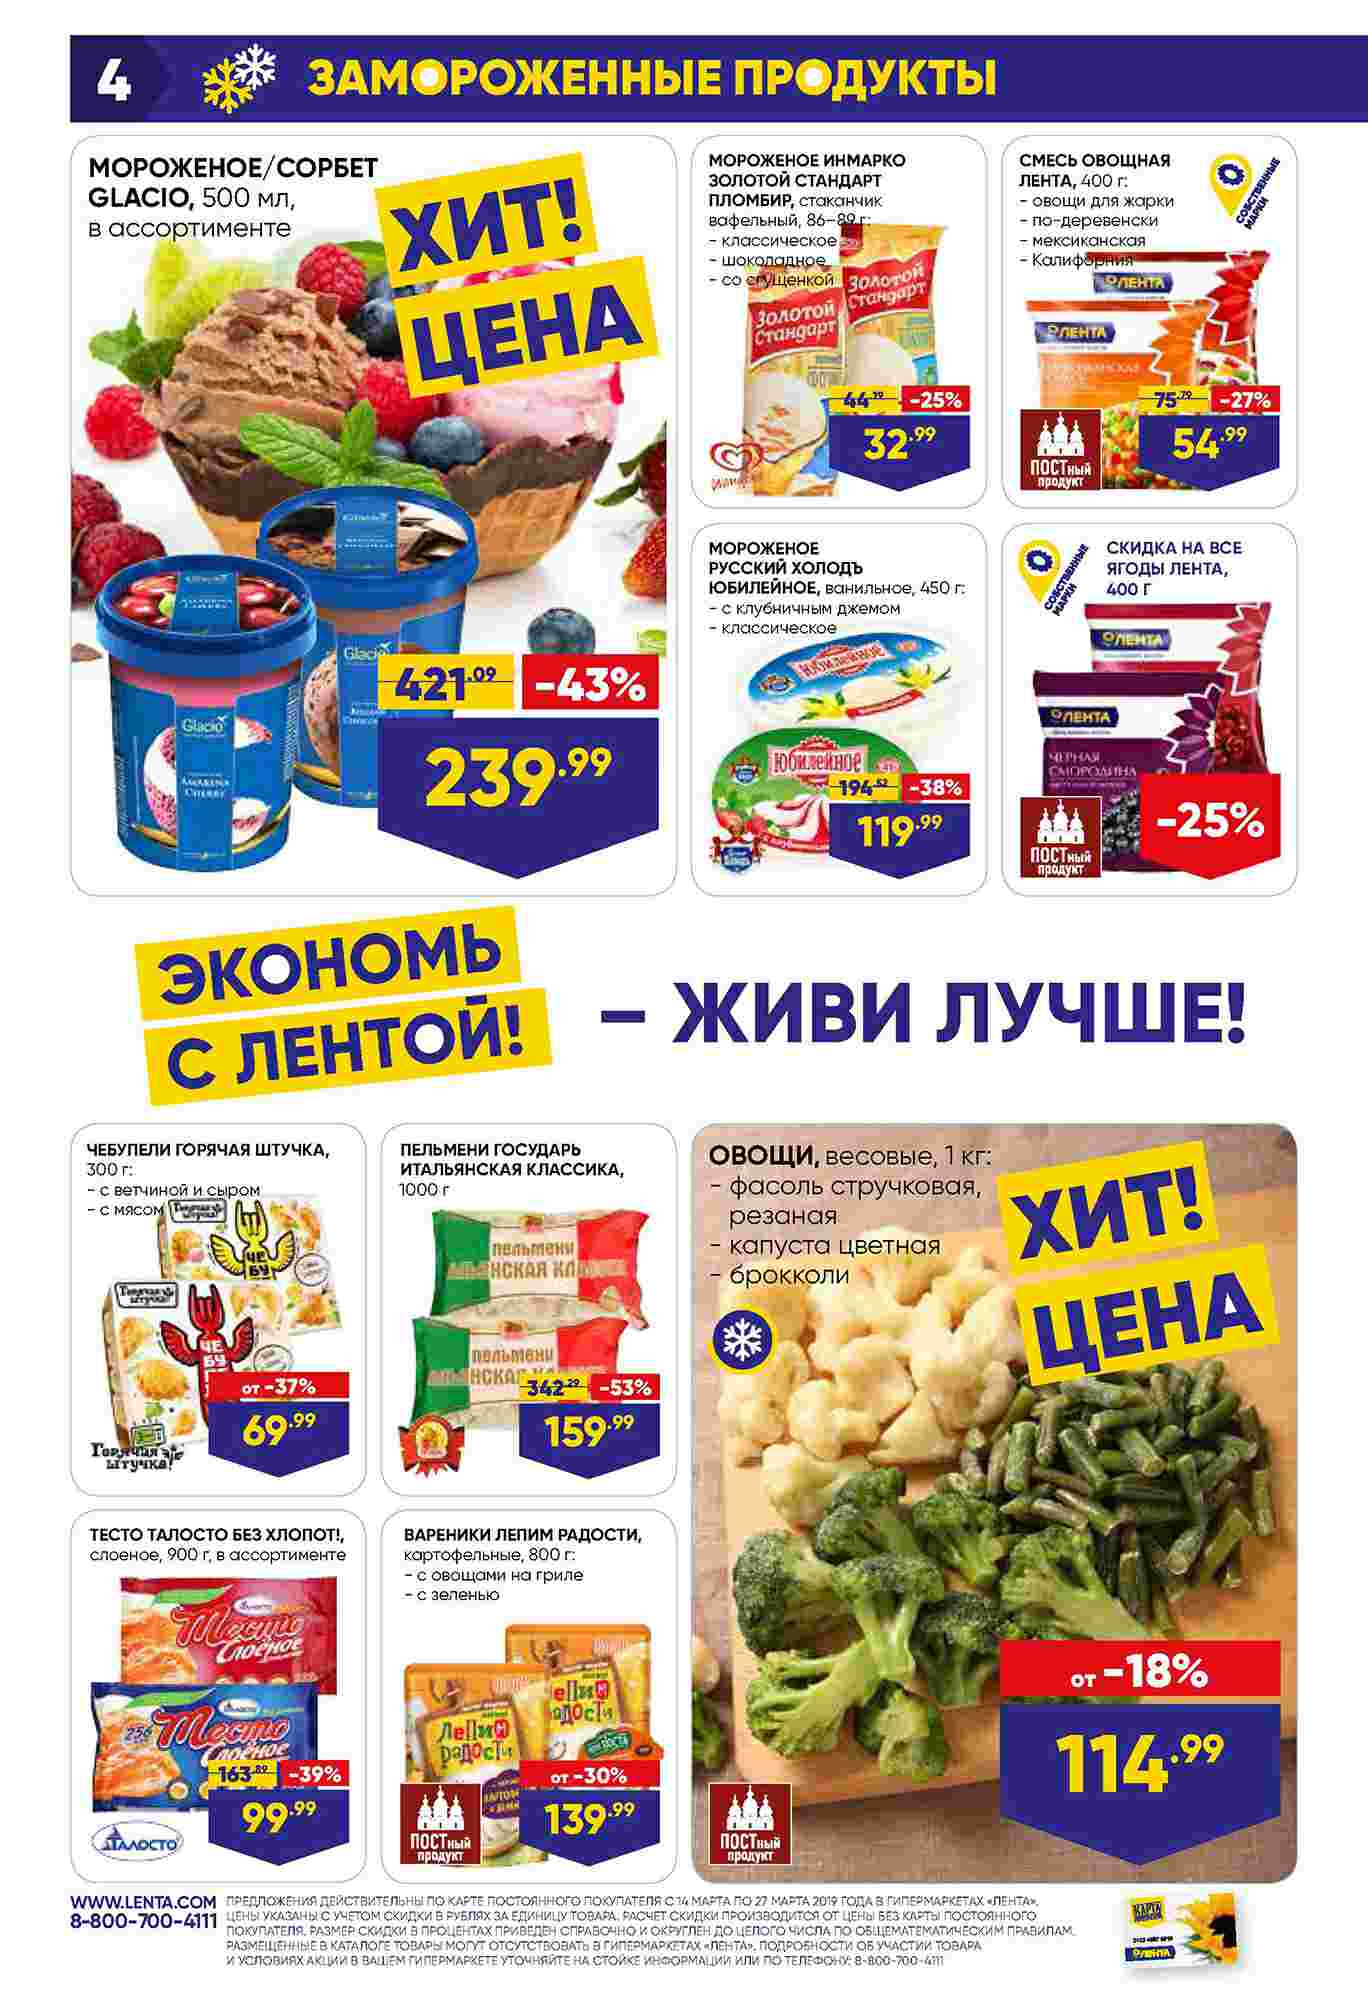 Каталог Лента гипермаркет 14-27.03.2019 стр. - 0001 - 0004